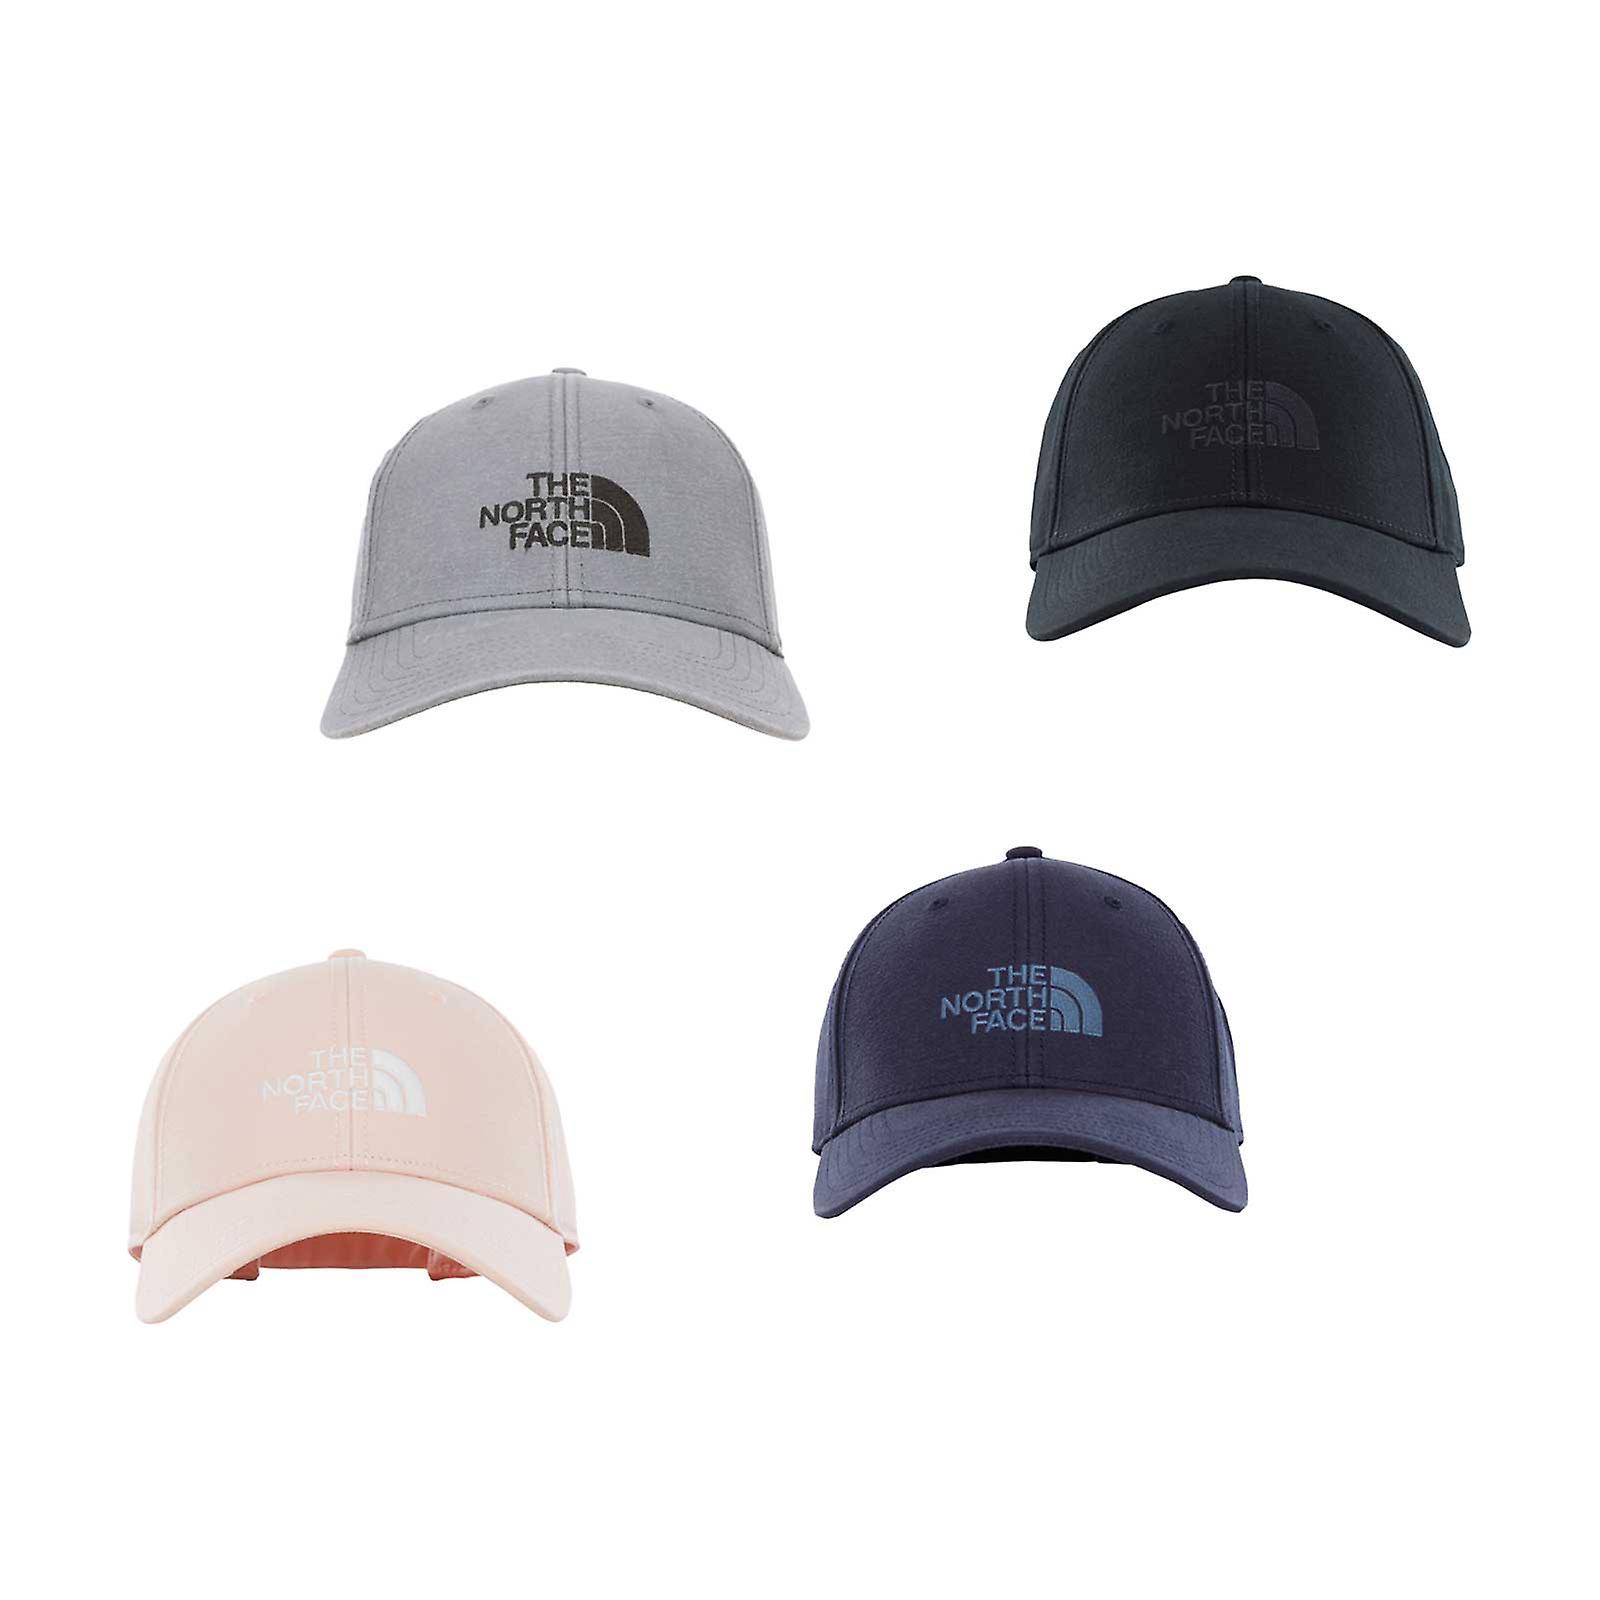 ed20c1e701c The North Face Mens 66 Classic Hat